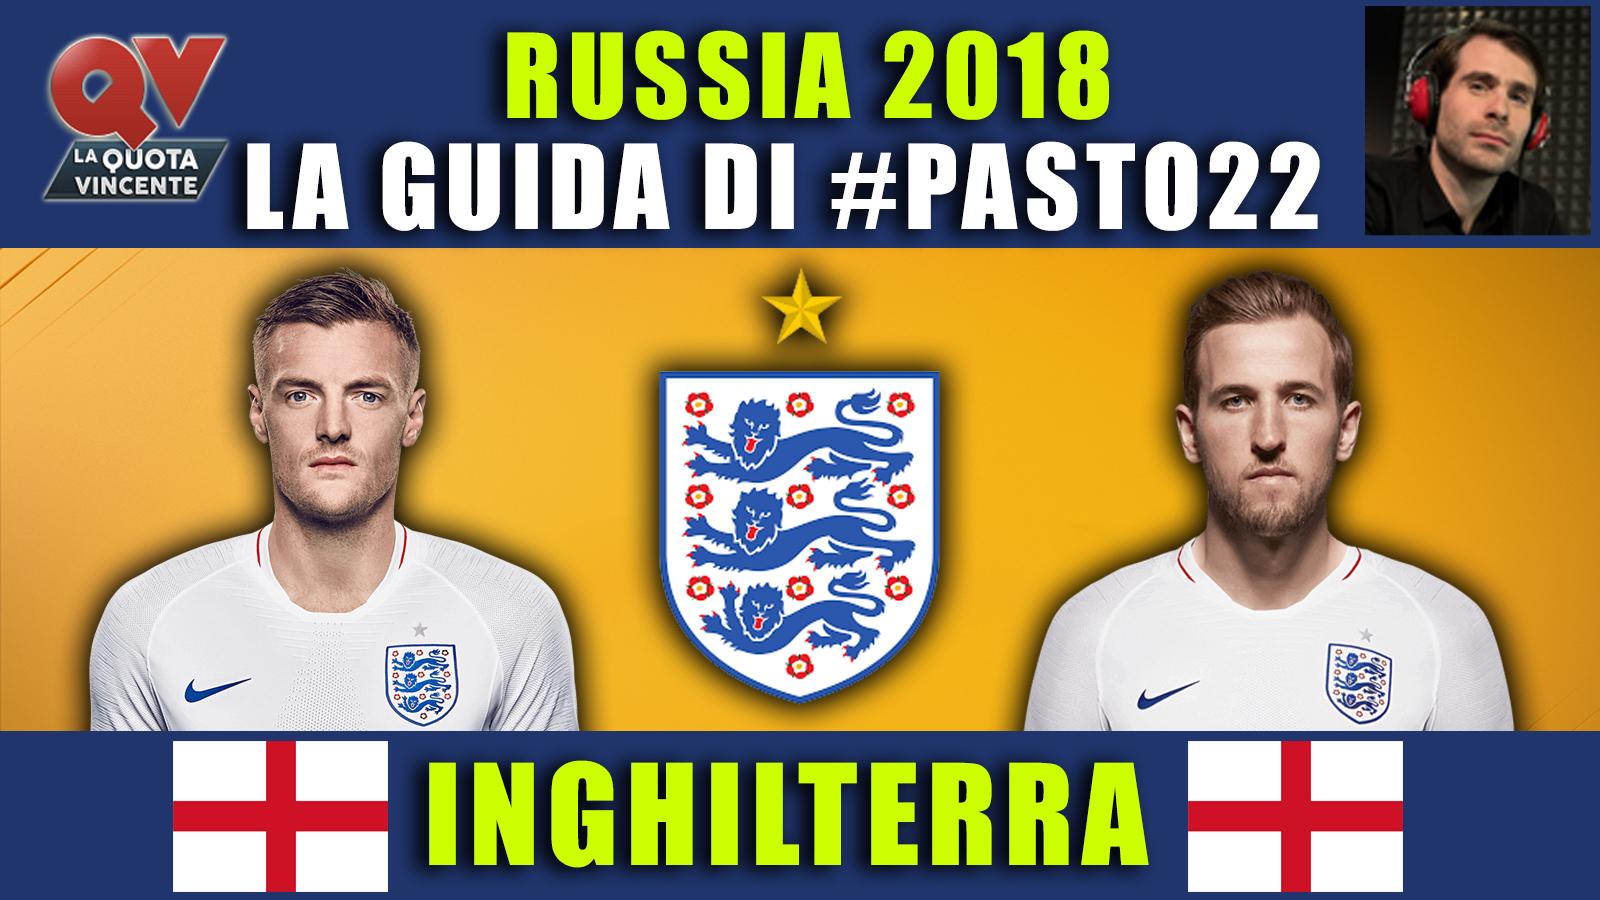 Guida Mondiali Russia 2018 Inghilterra